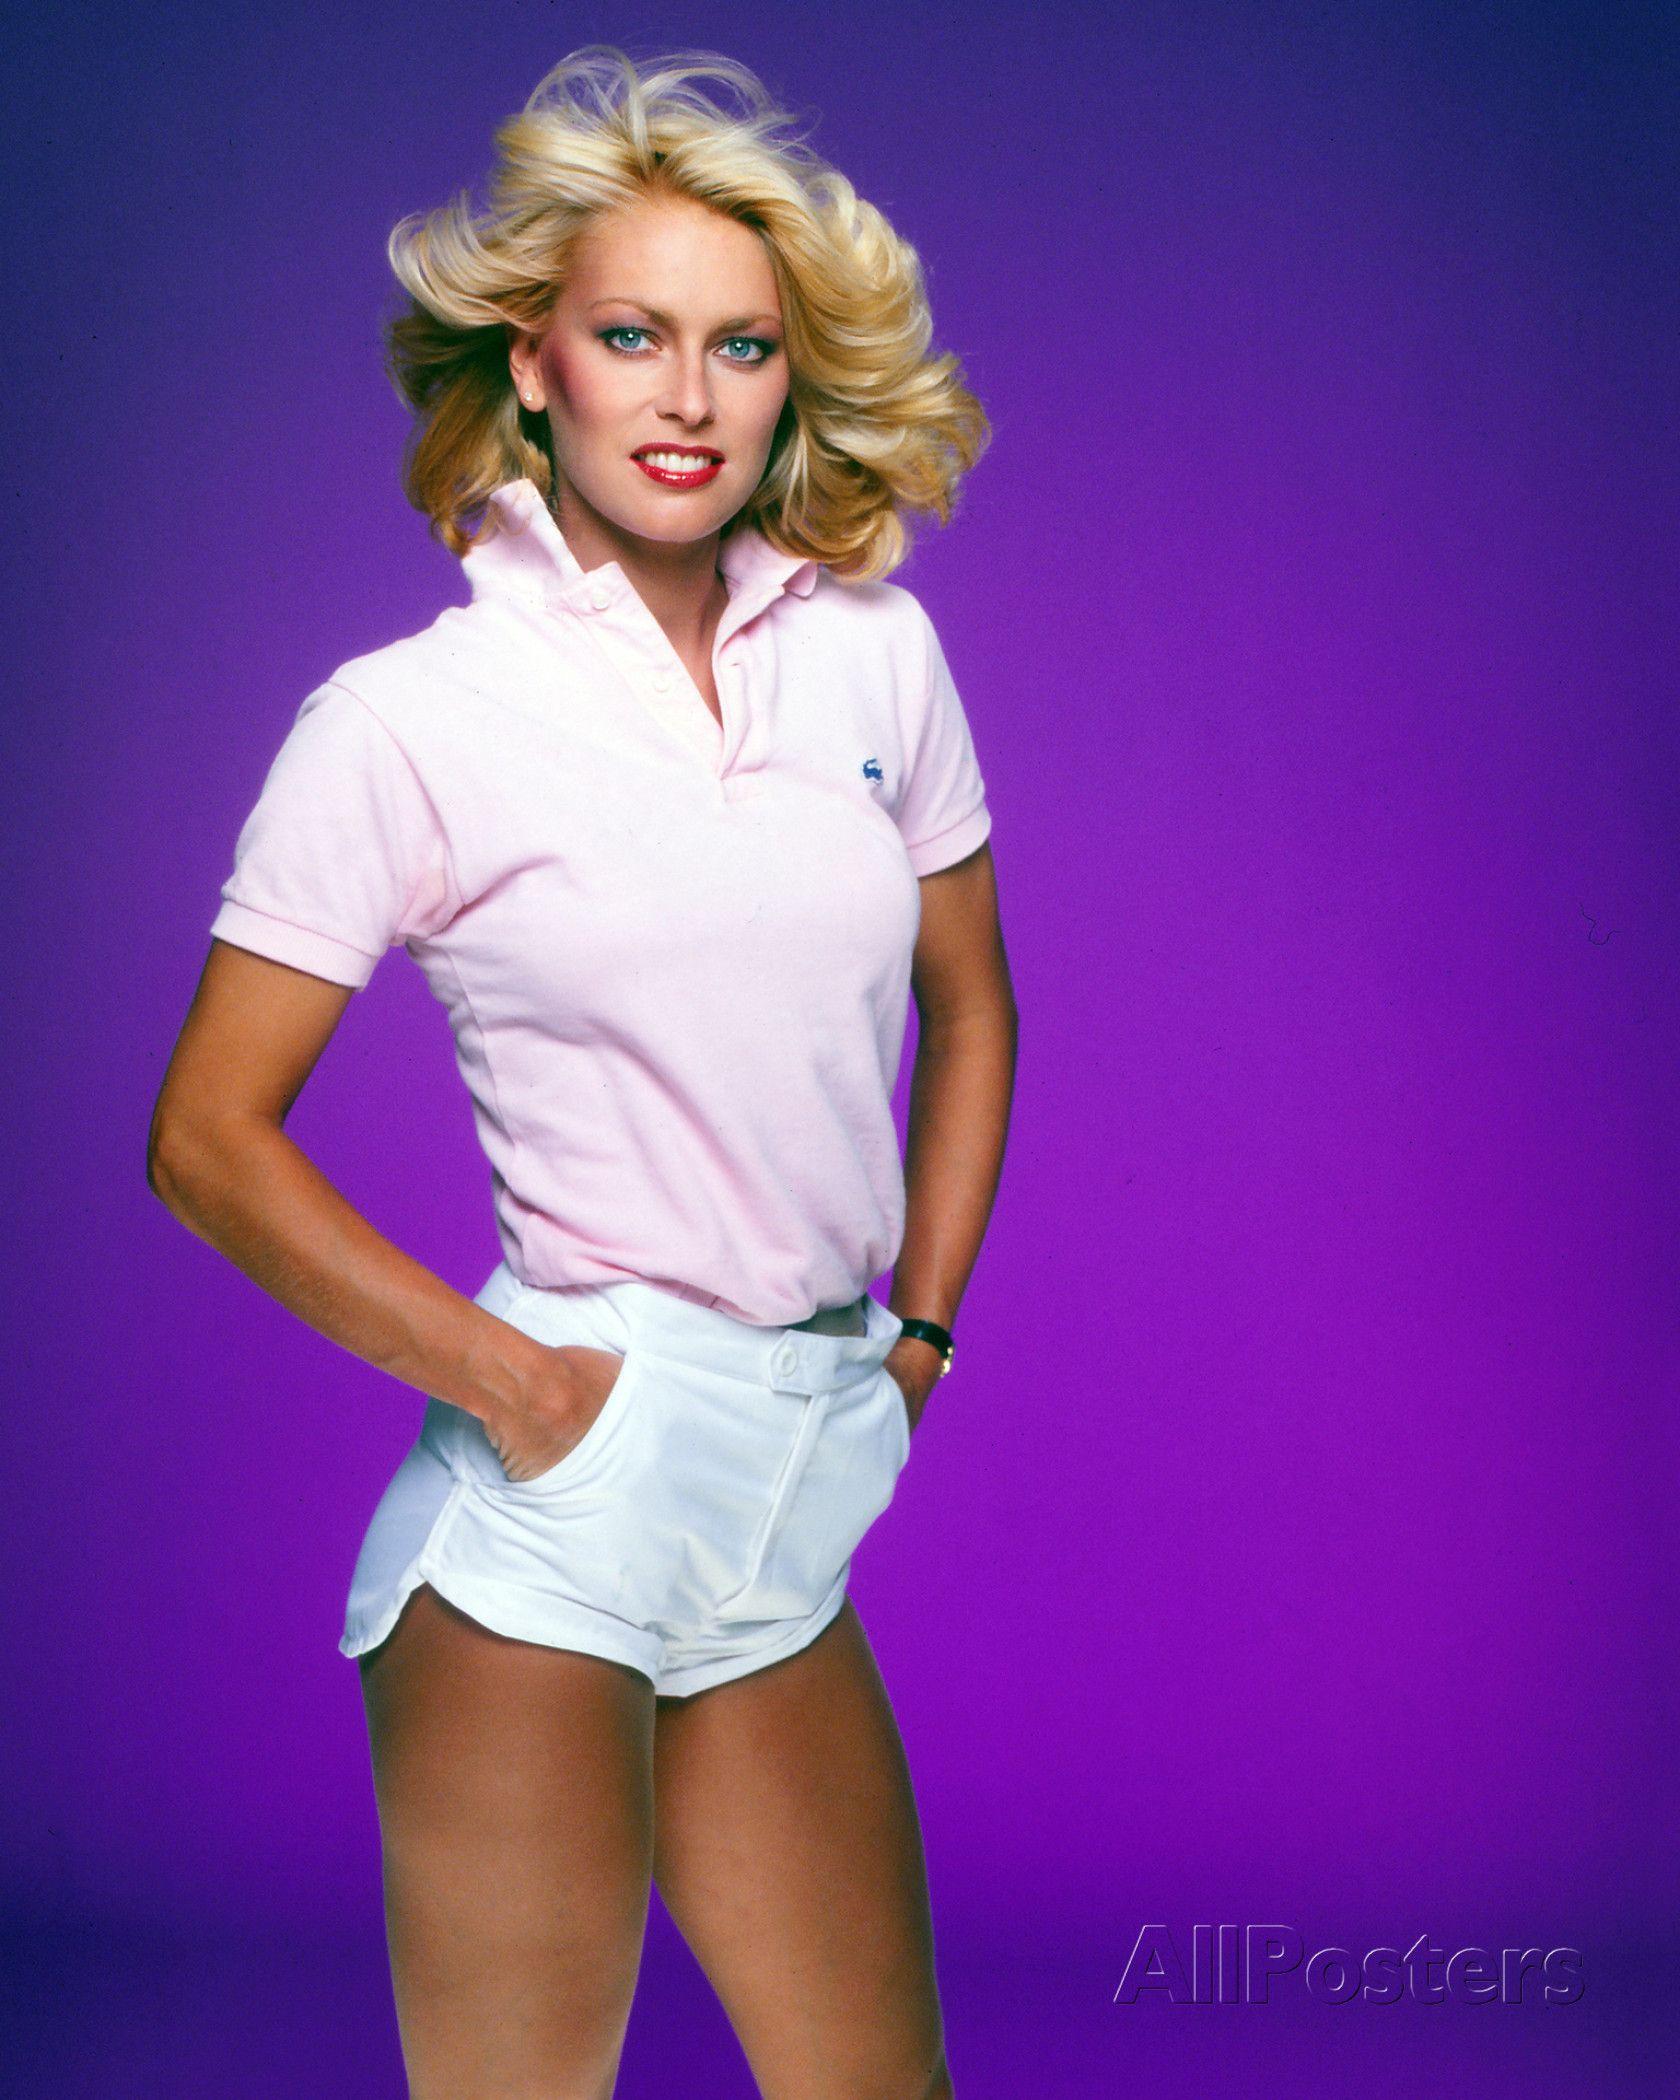 Randi Oakes   Oakes, Blonde actresses, Actresses